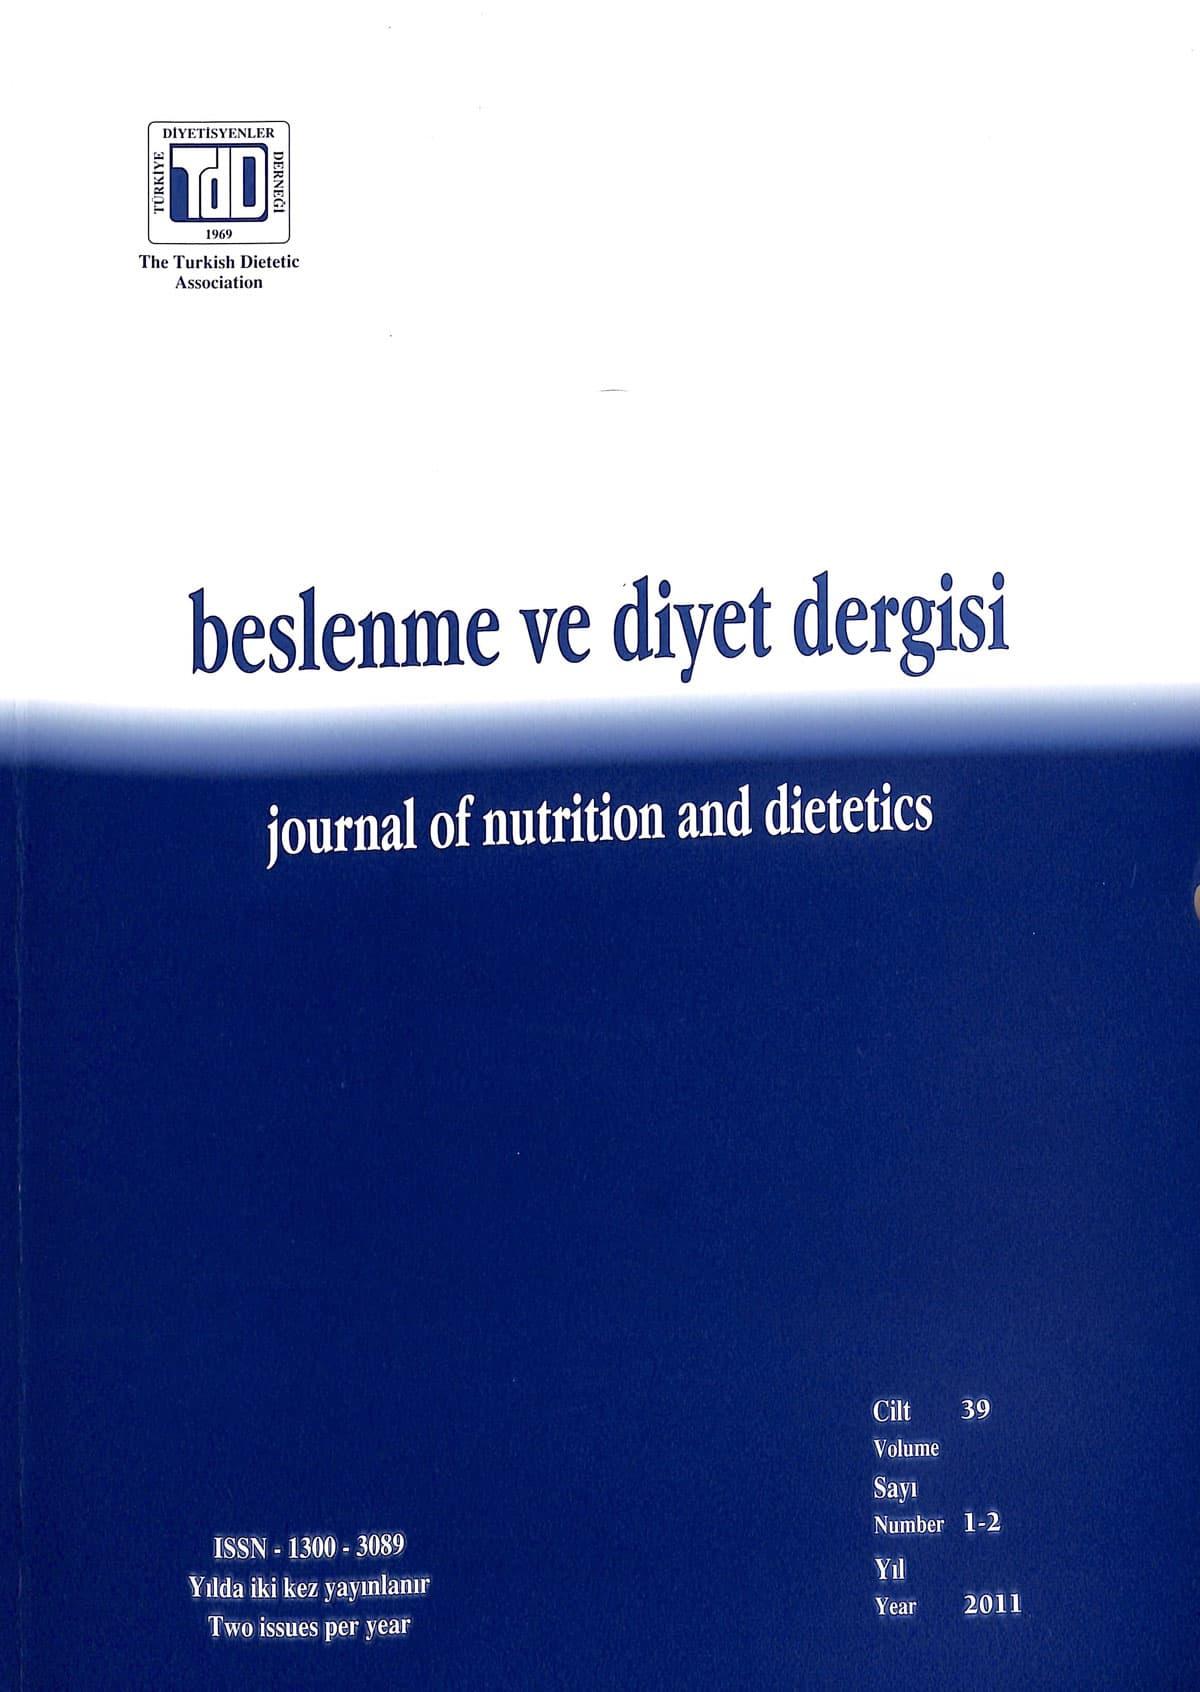 Cilt 39 Sayı 1-2 (2011)